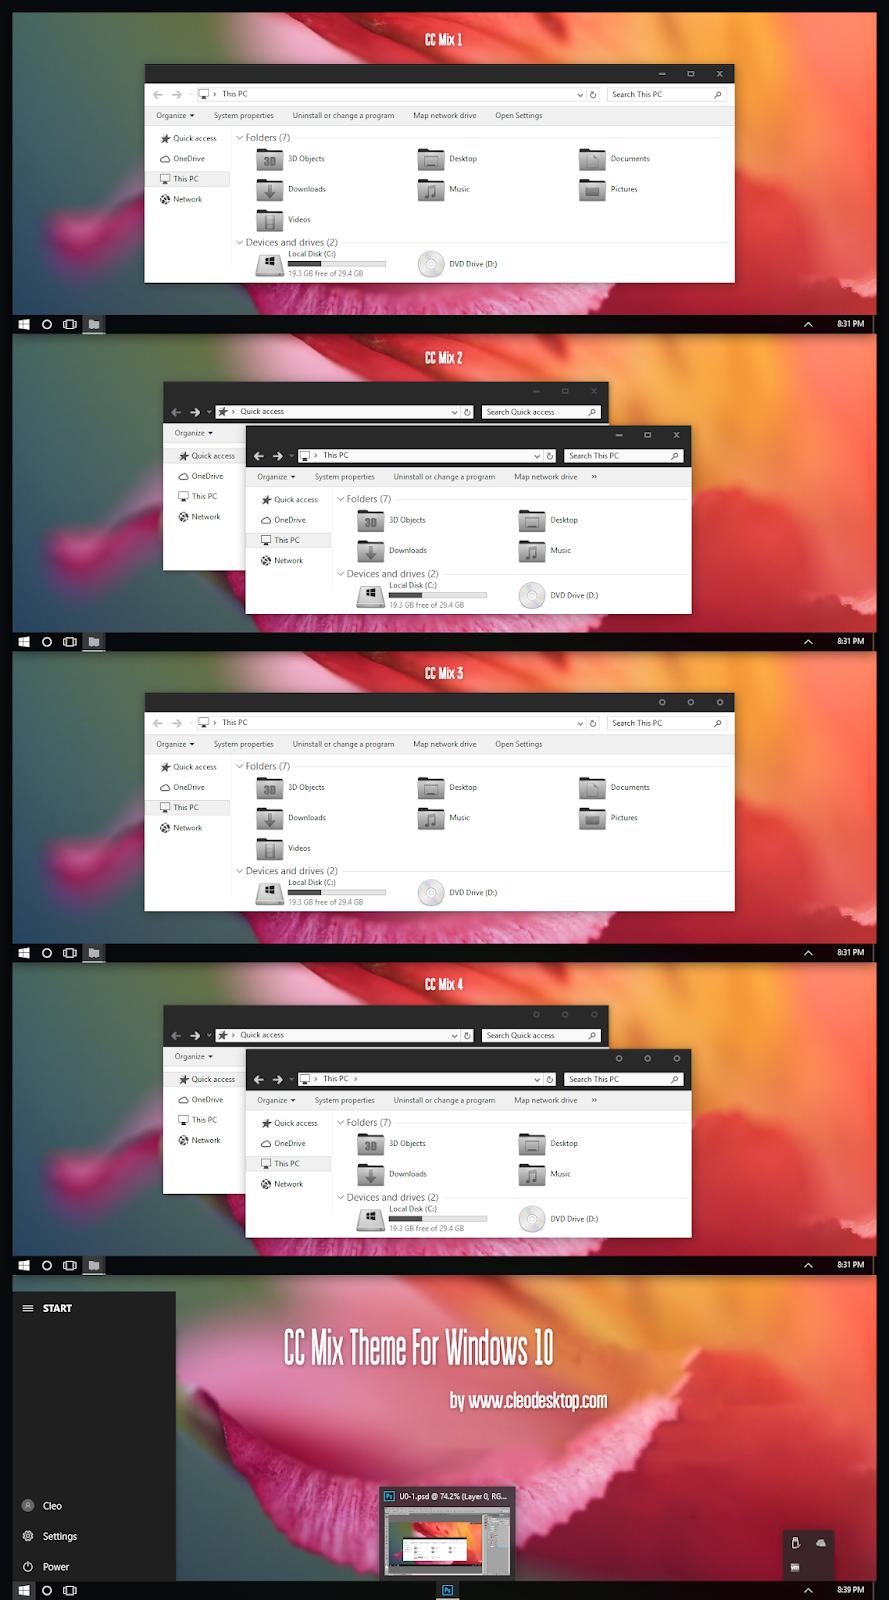 CC Mix Theme Windows10 November 2019 Update 1909